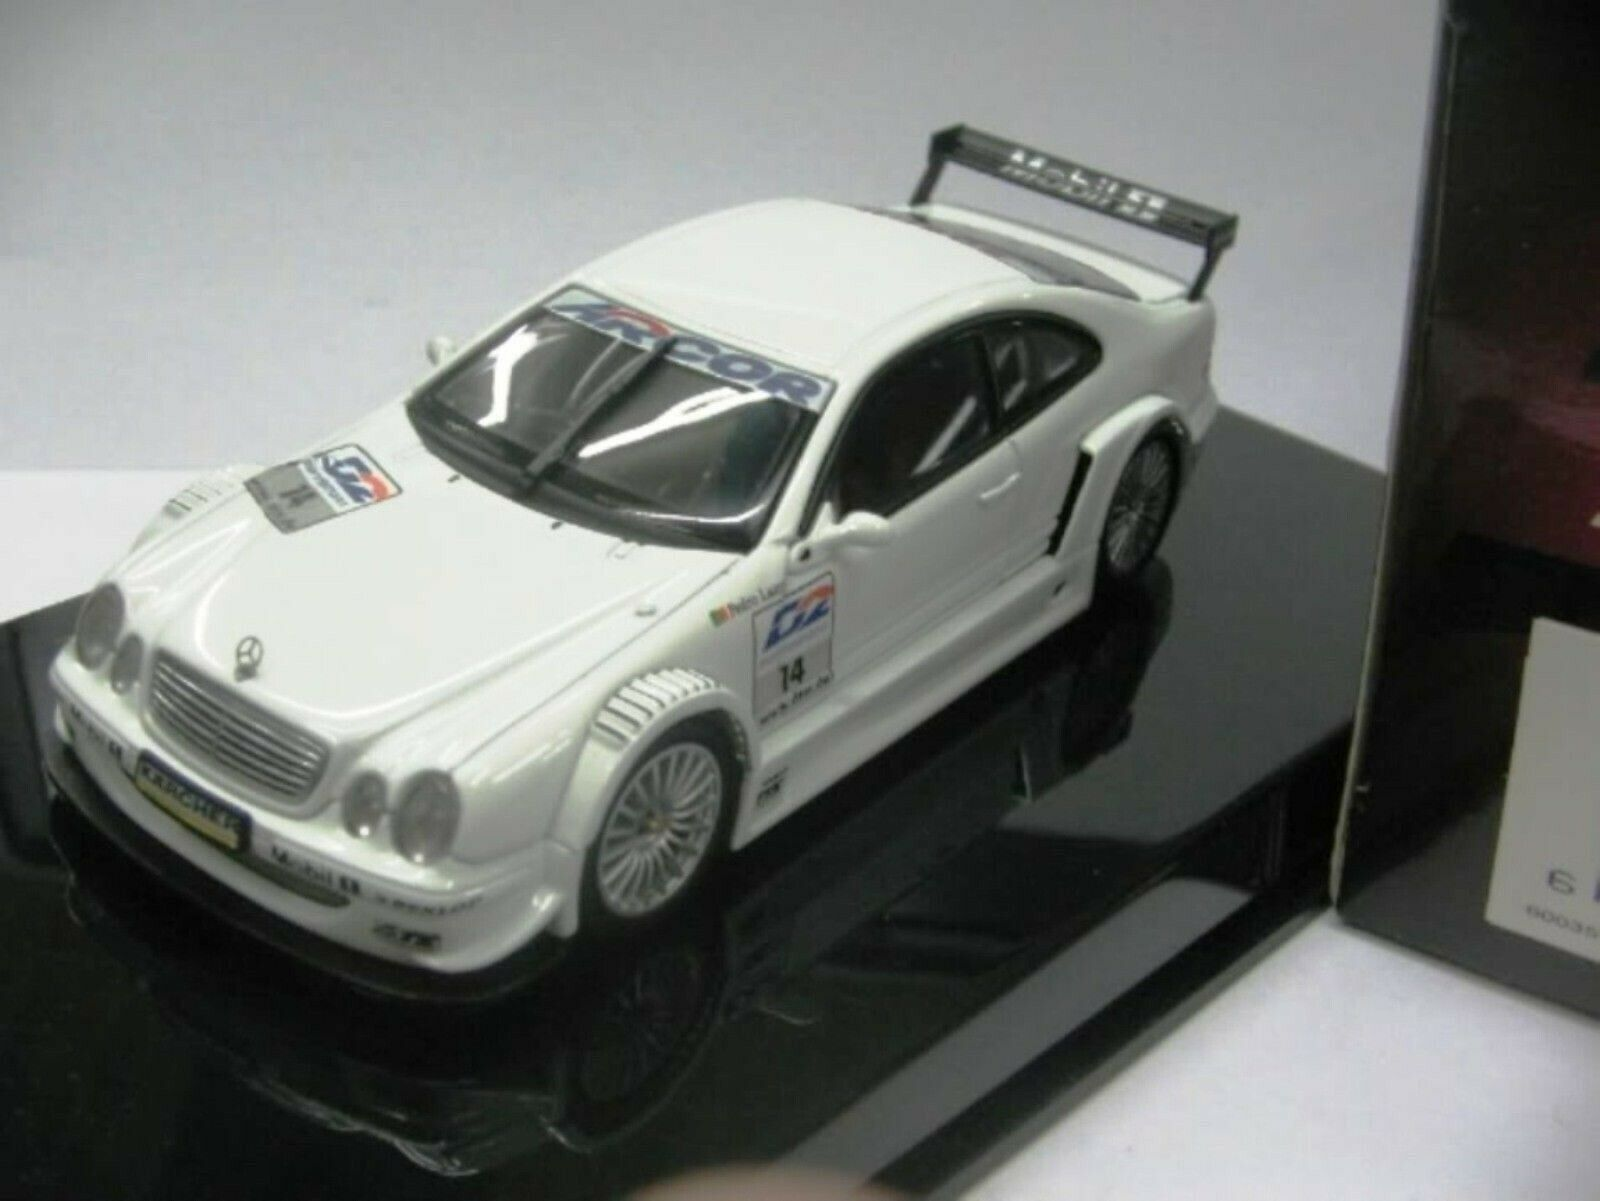 Wow extremamujerte raro Mercedes DTM 2000 CLK400 Lamy 1 43 Auto Art-Minichamps